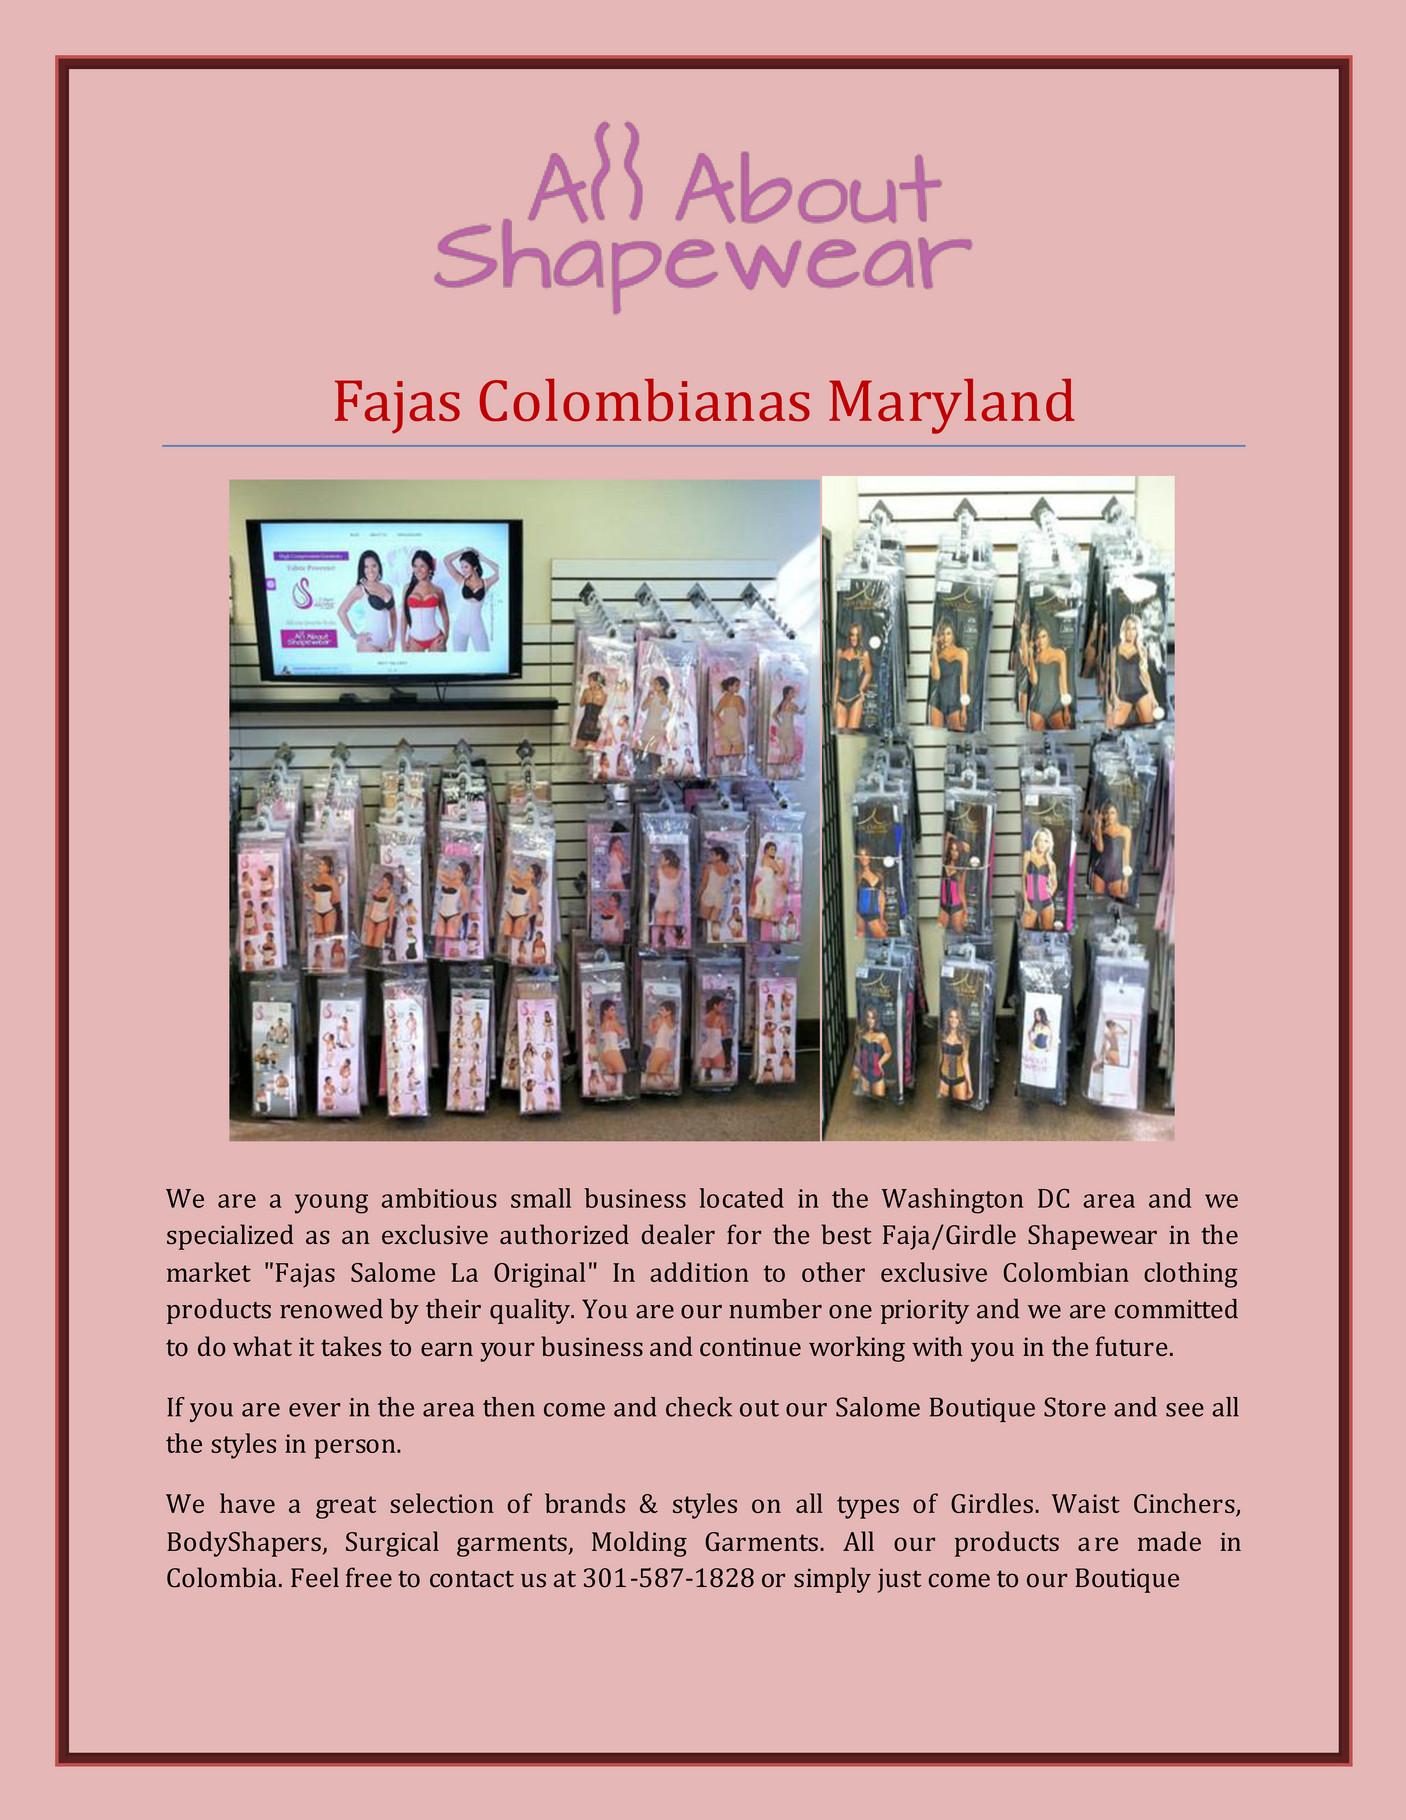 allaboutshapewear - Fajas Colombianas Maryland - Page 1